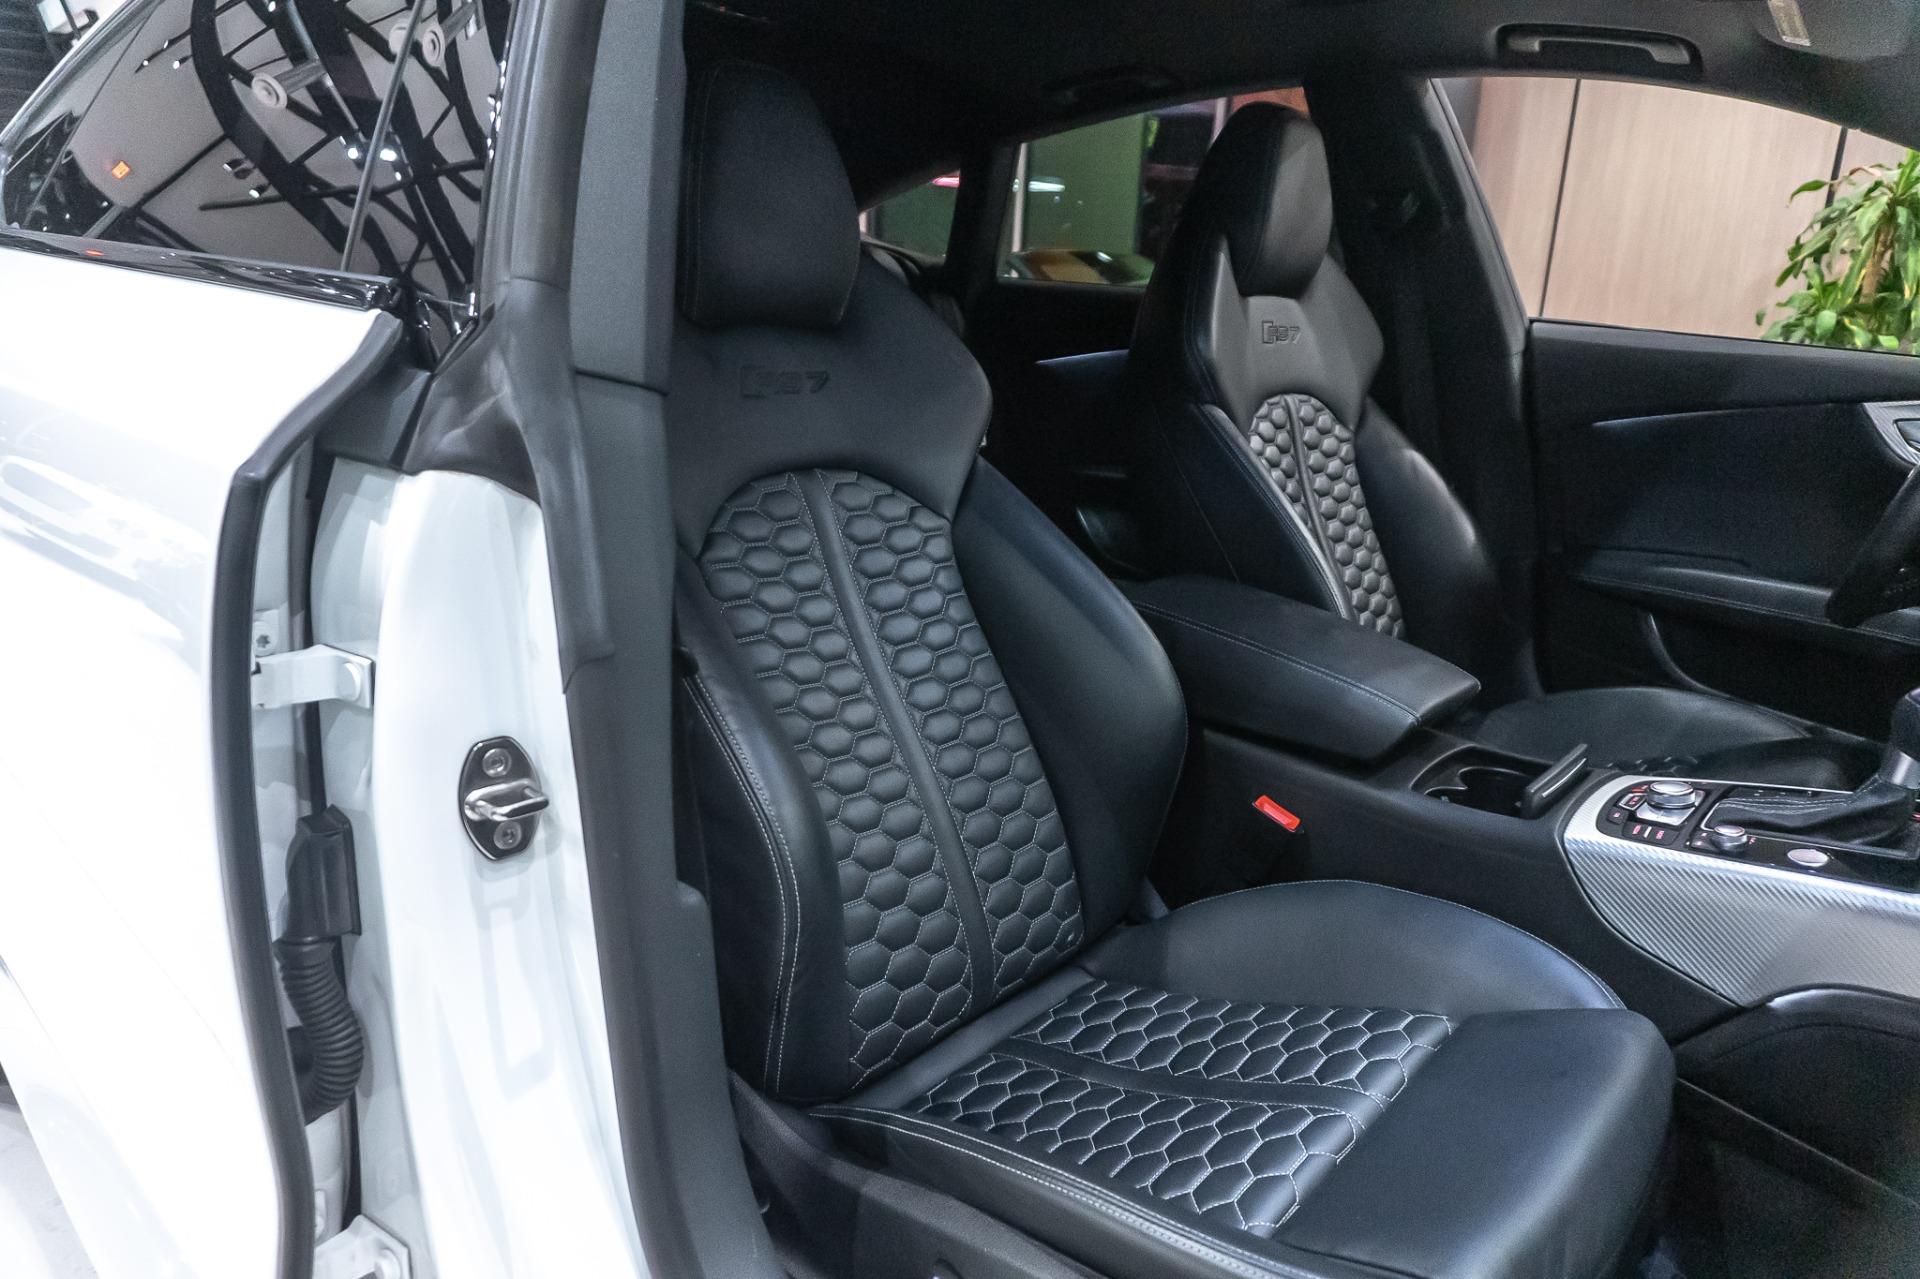 Used-2015-Audi-RS7-40T-quattro-Prestige-Sedan-Milltek-Exhaust-AMS-Tune